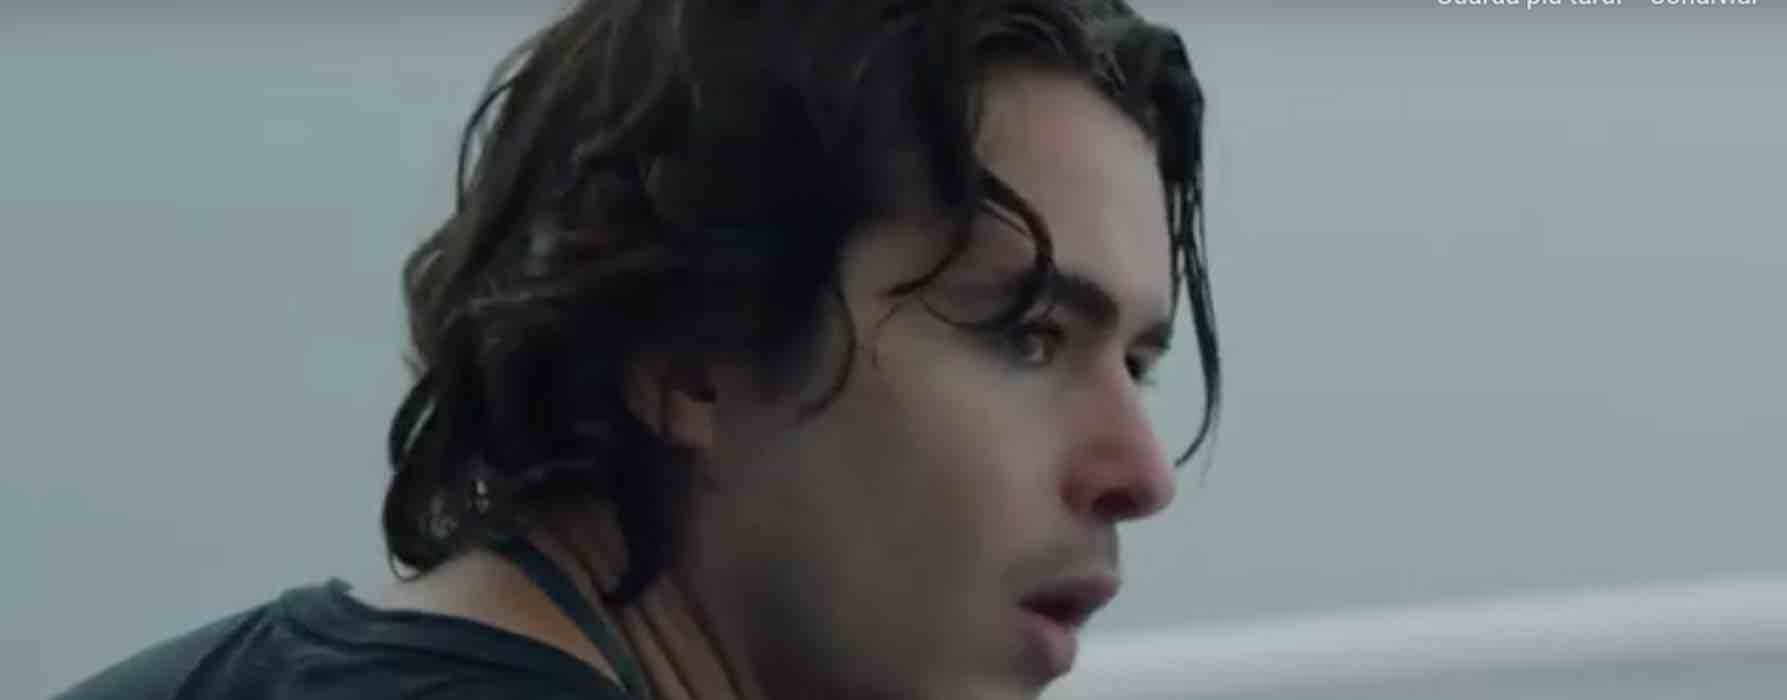 Marcus Goldman - chi è l'attore Ben Schnetzer nella serie Harry Quebert